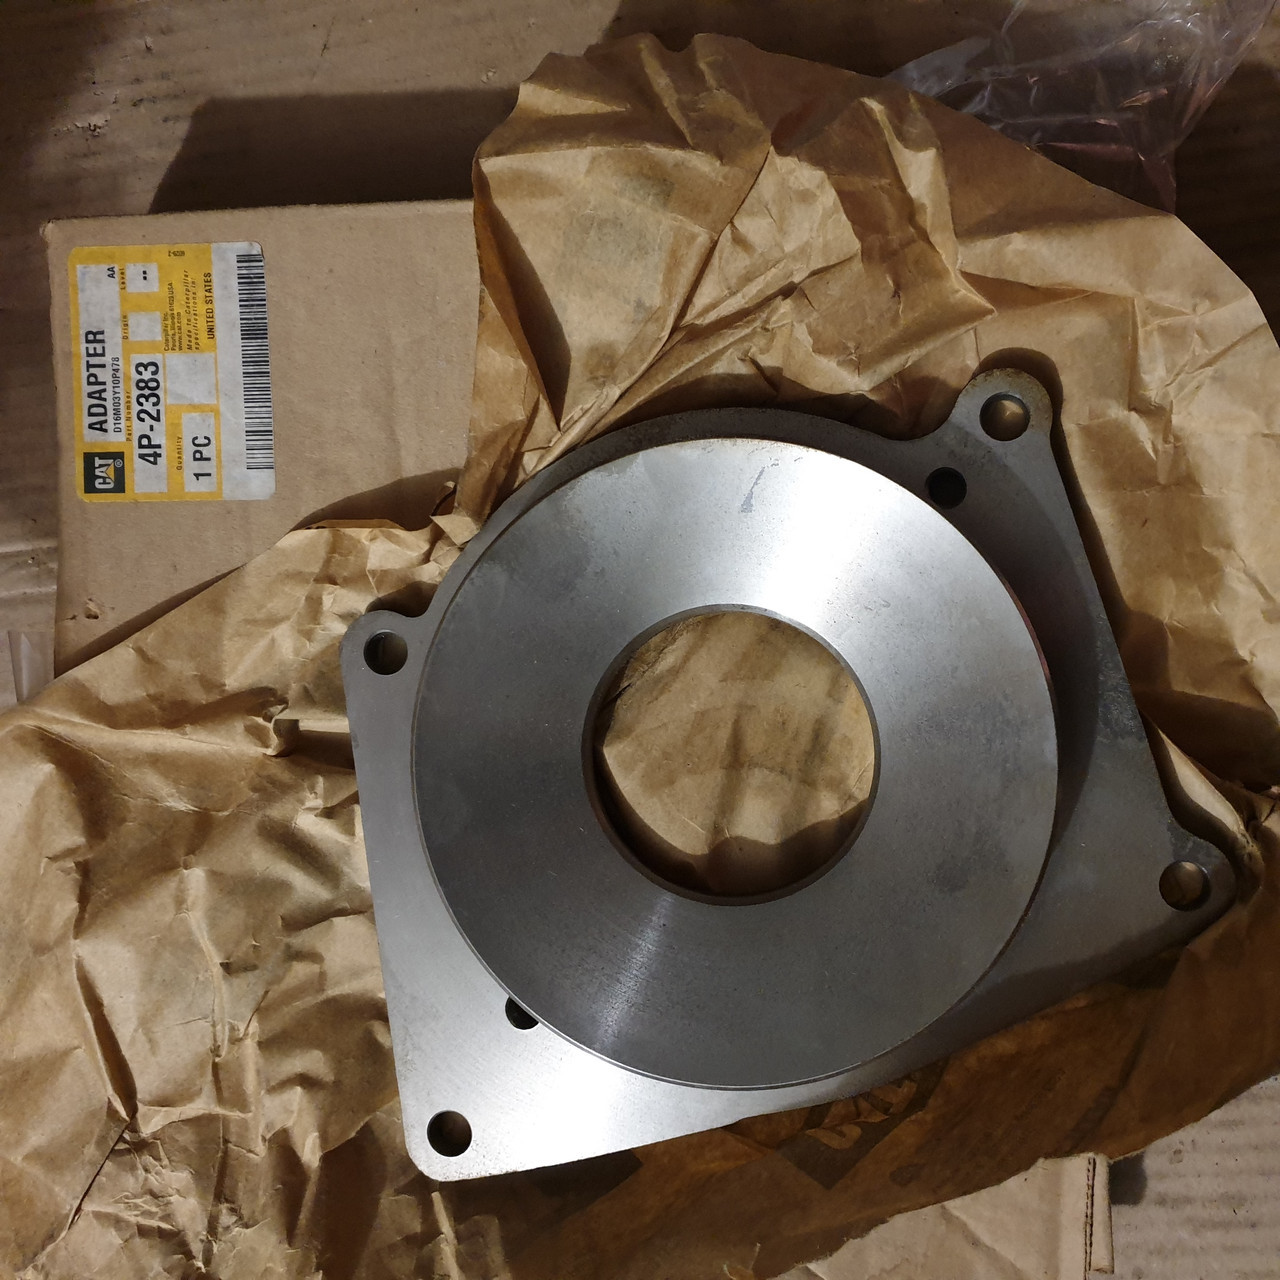 4P-2383 Адаптер помпы  Water Pump Inlet Adapter MARINE PRODUCTS C18, 3406C, 3406B, C15, 3406E